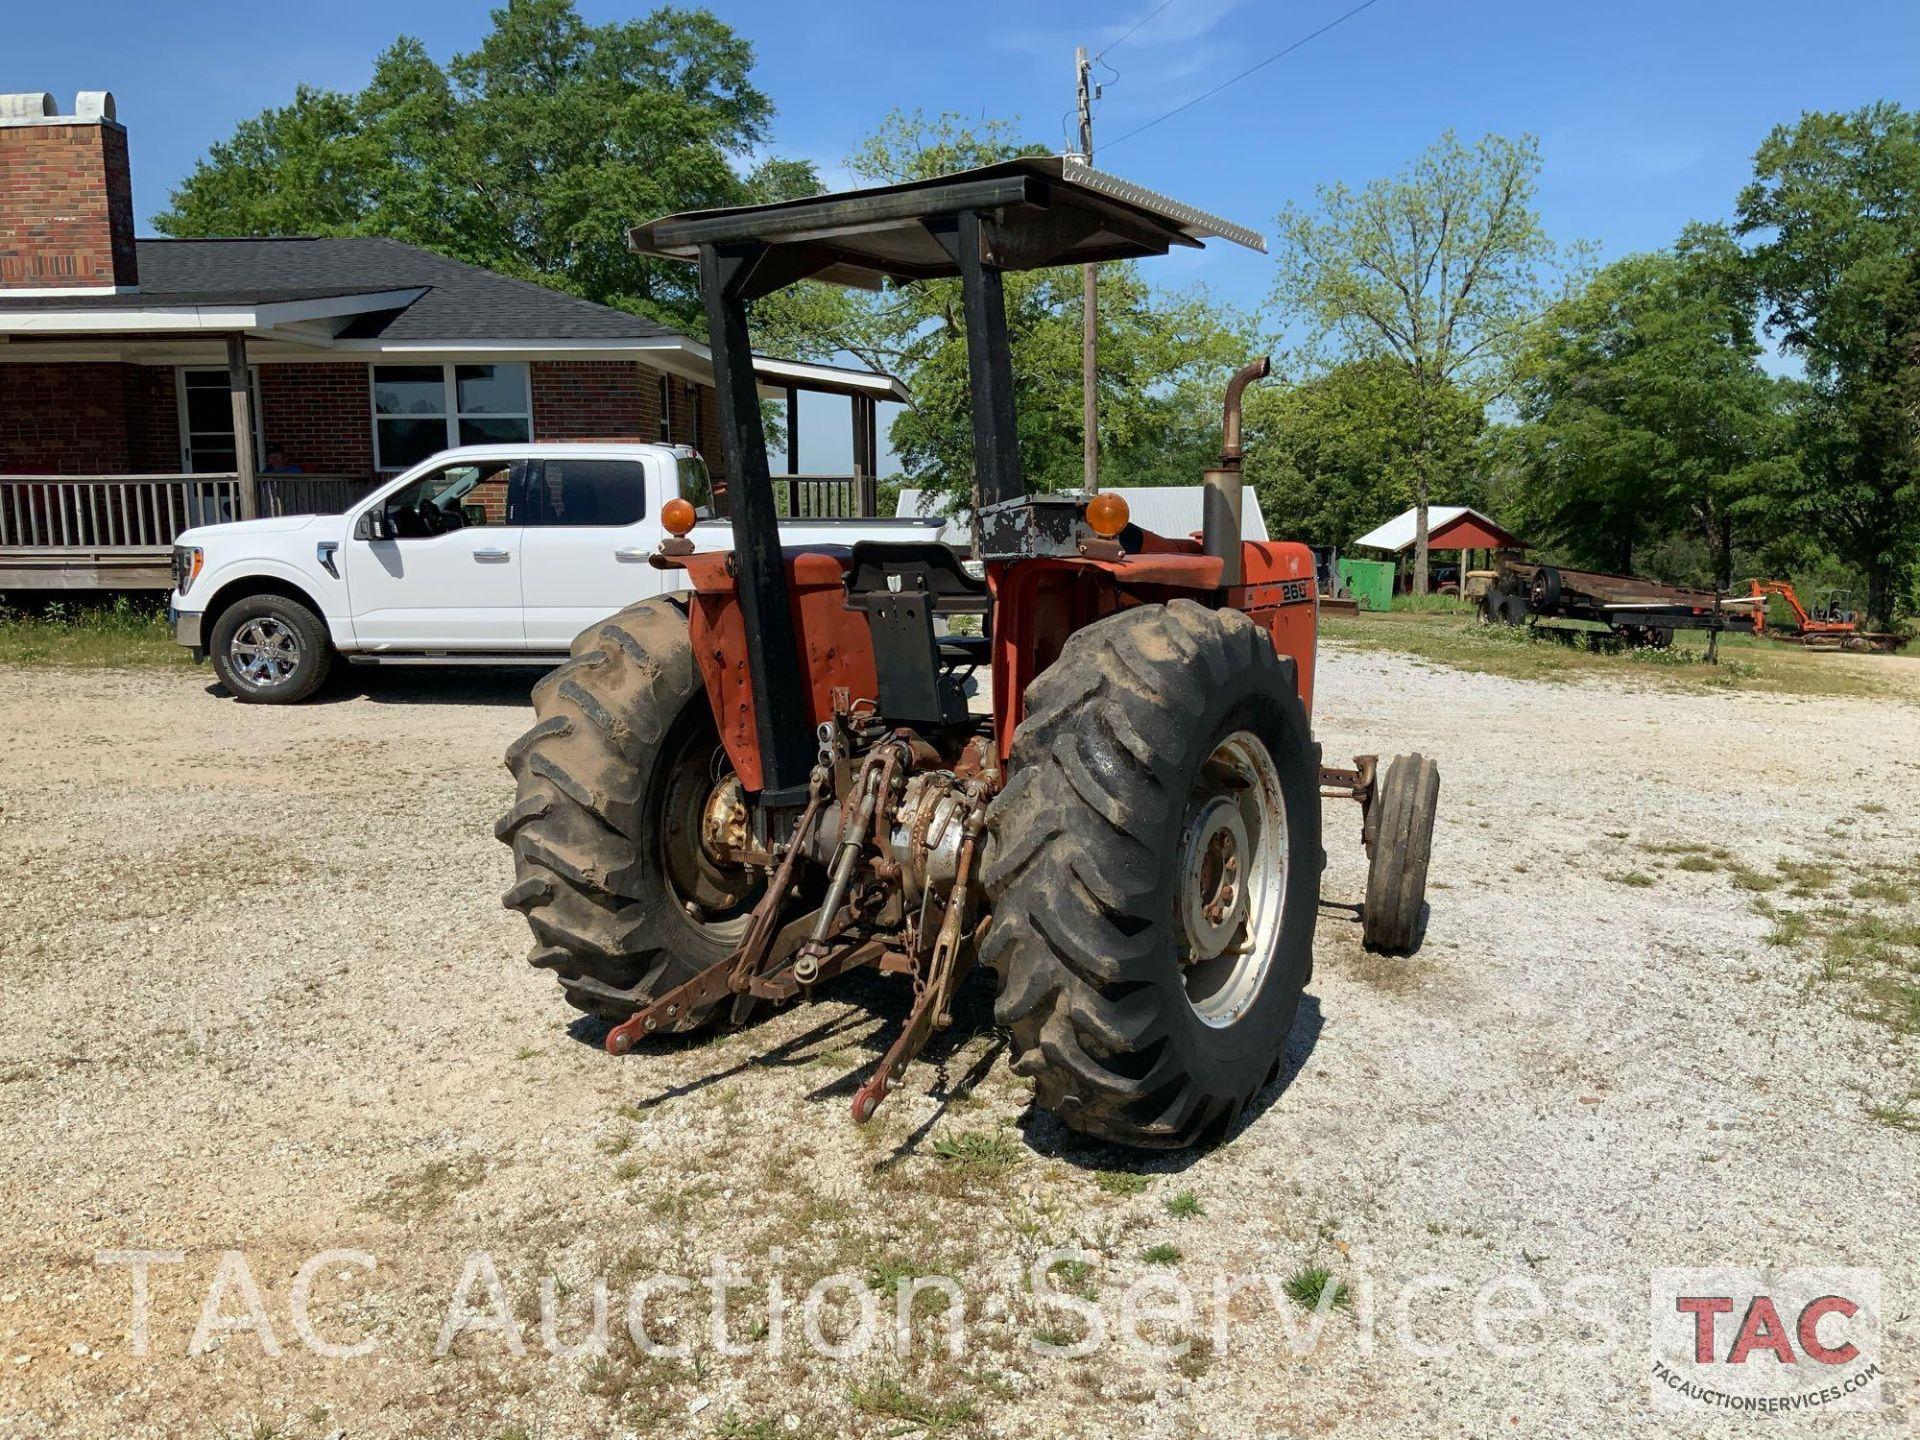 Massey Ferguson 265 FarmTractor - Image 8 of 23